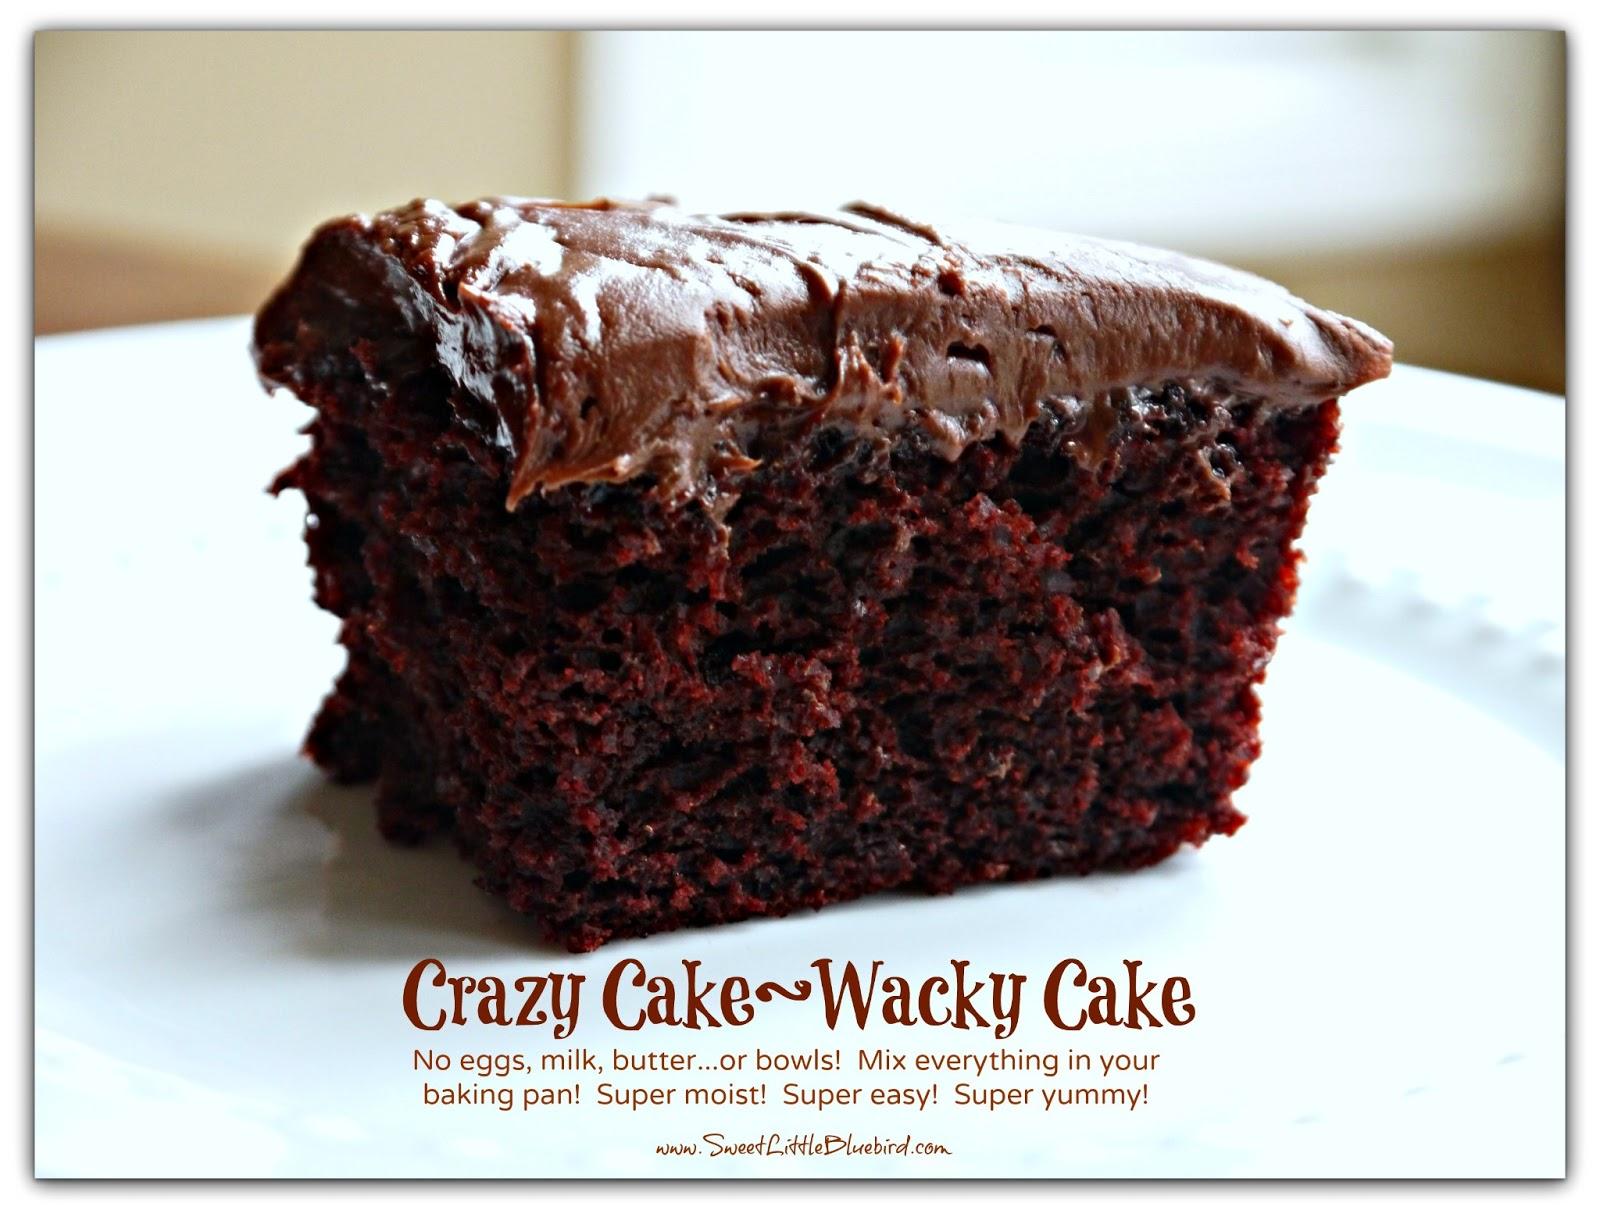 Cake Recipe During Great Depression